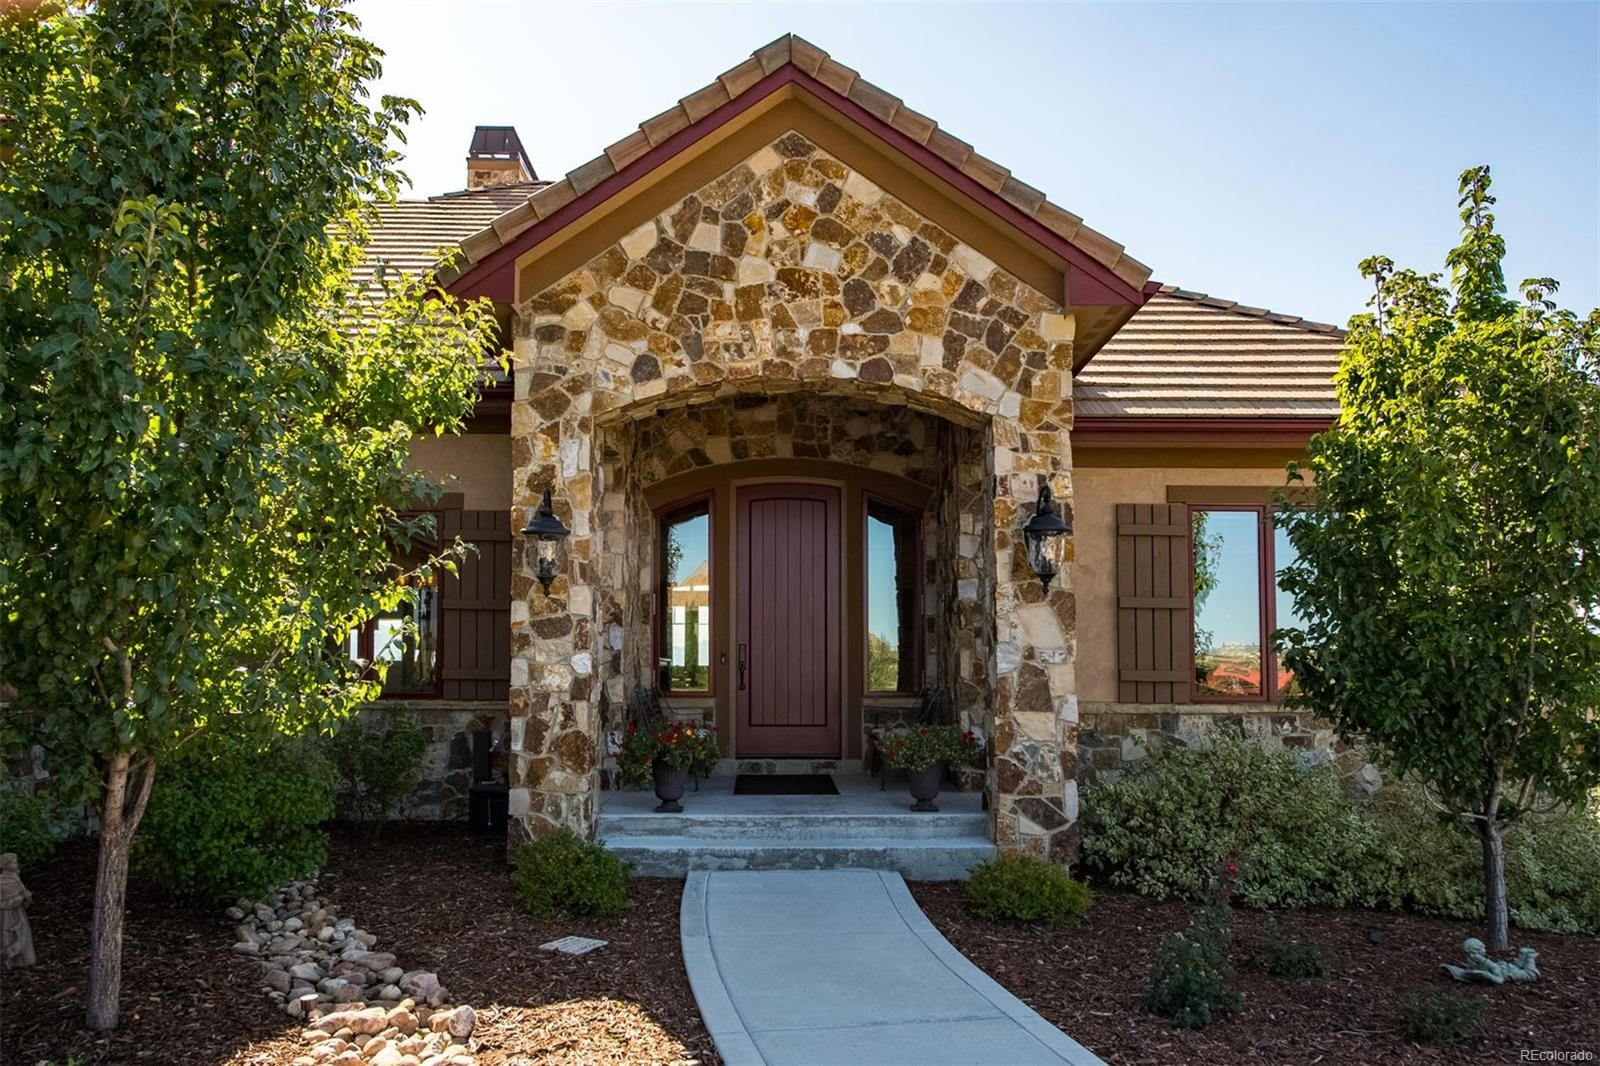 MLS# 9624600 - 2 - 5695 Aspen Leaf Drive, Littleton, CO 80125